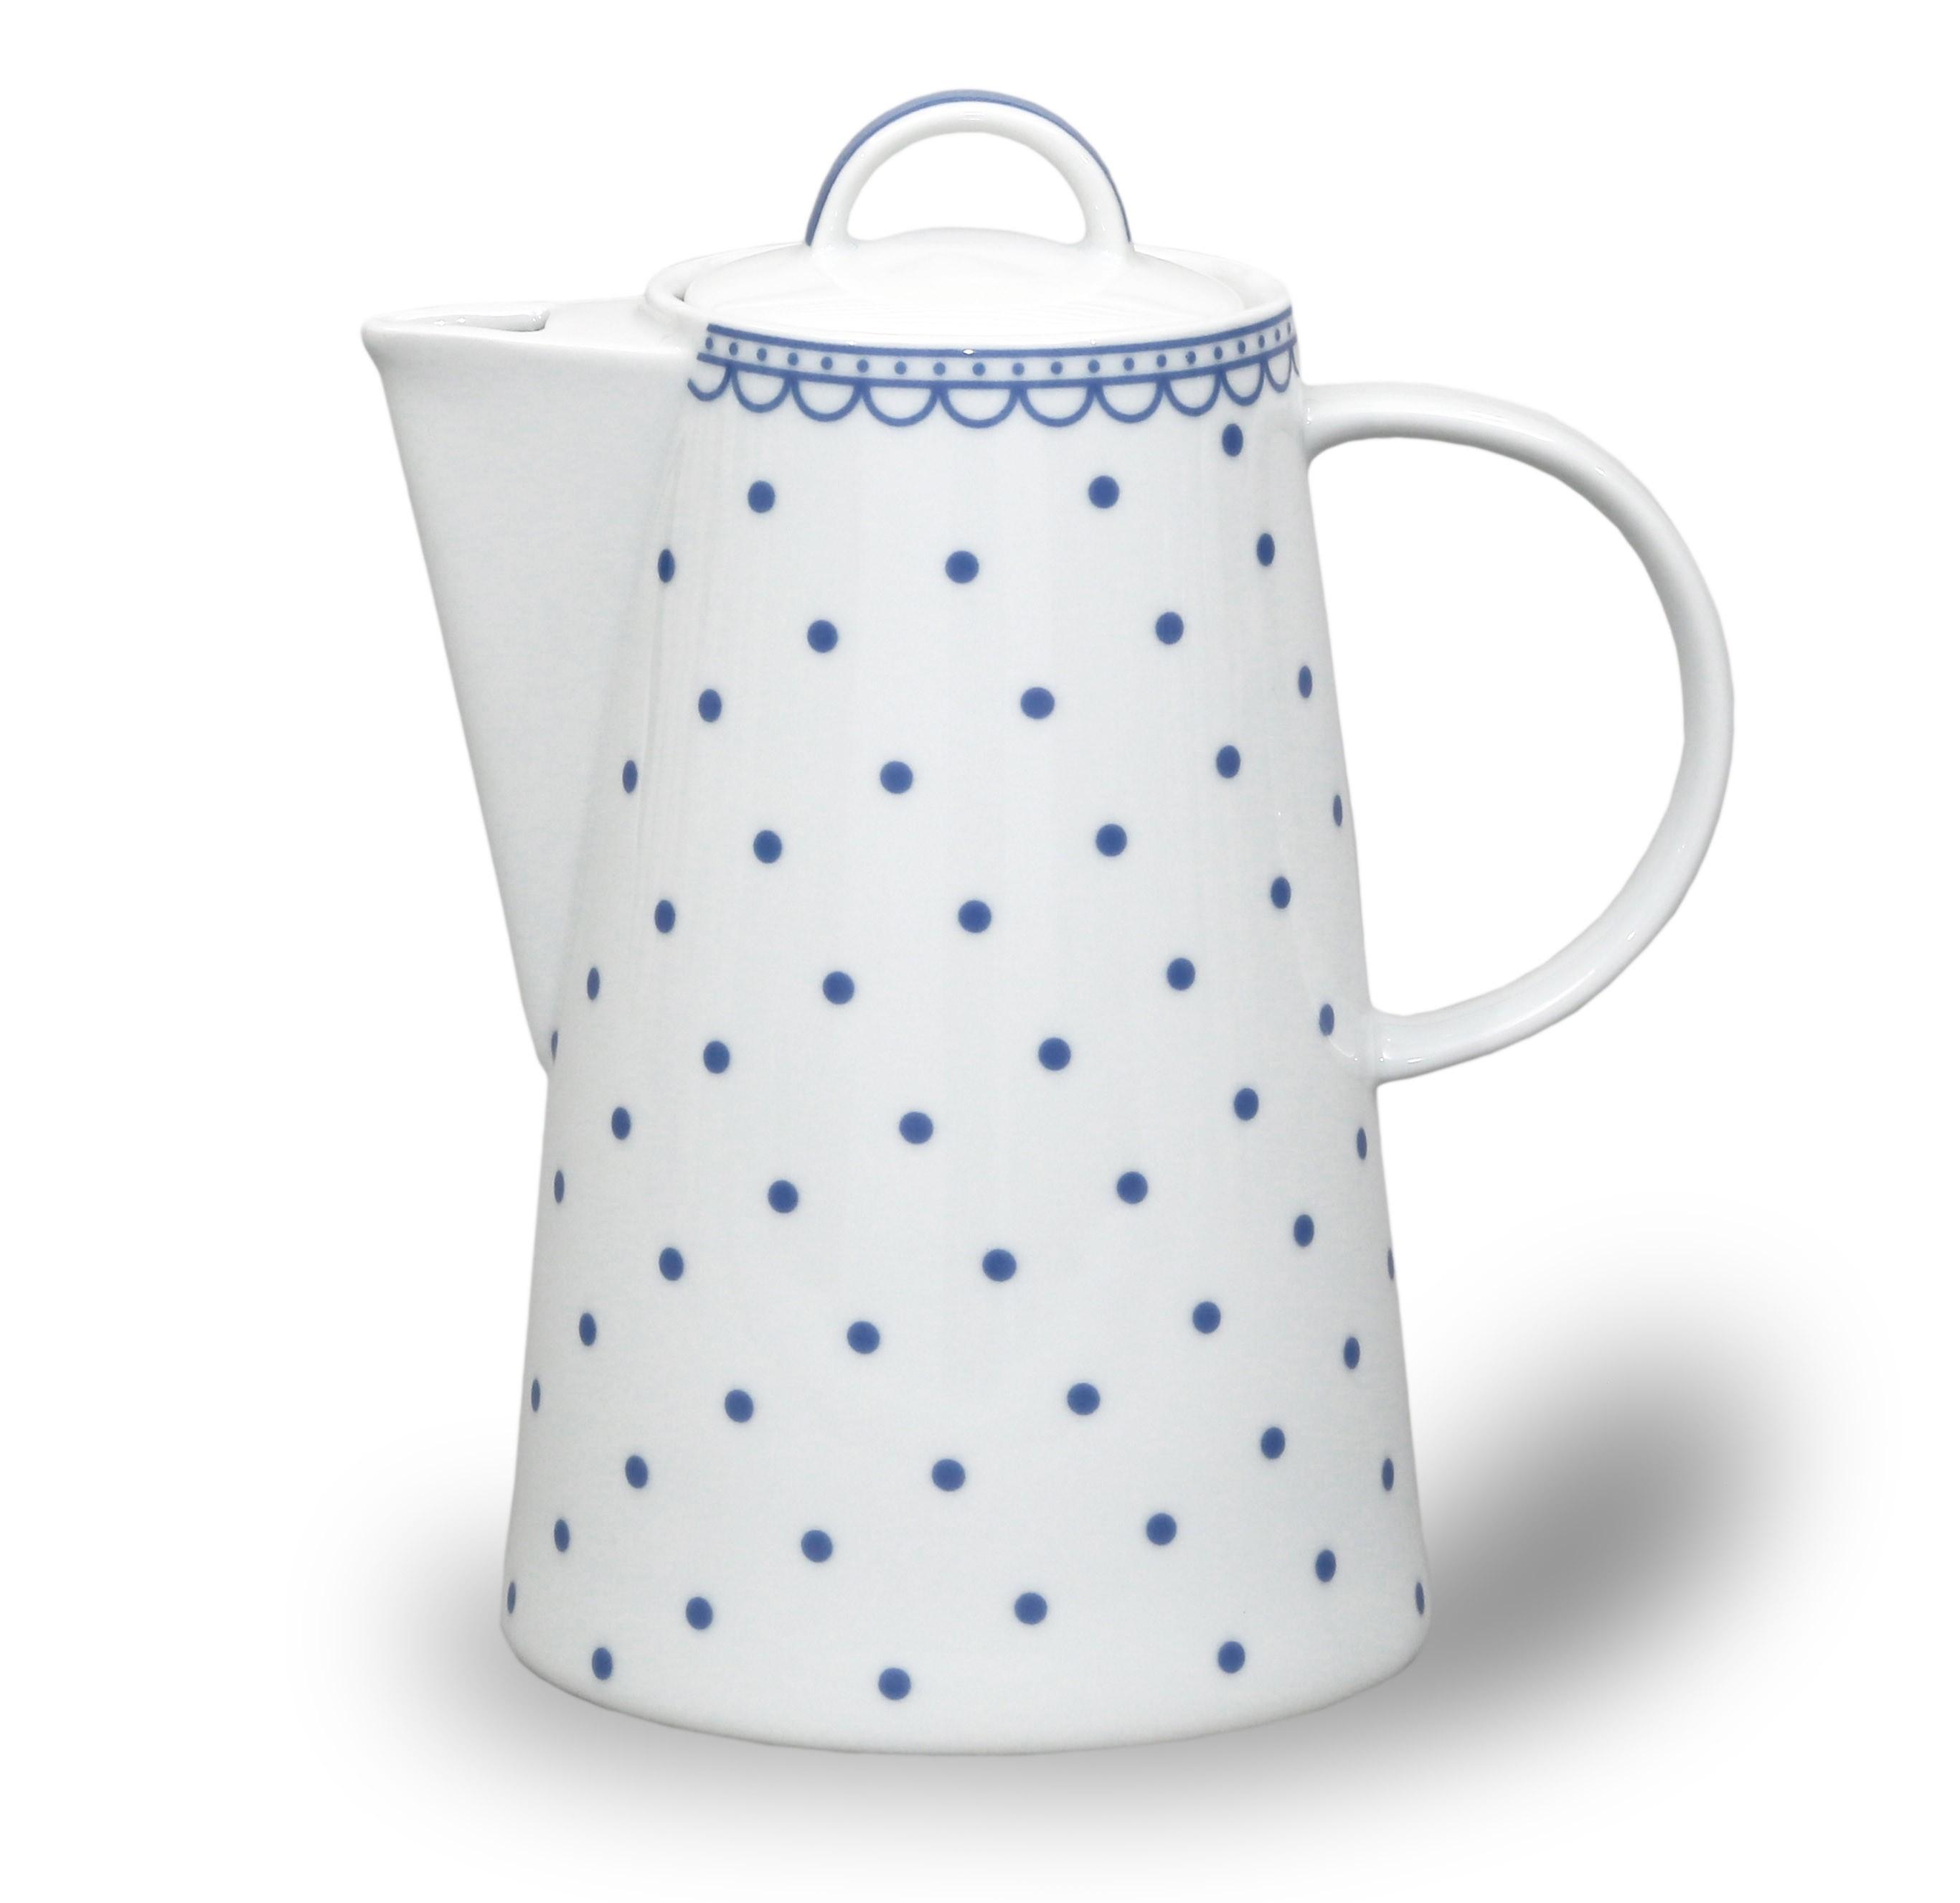 Kávová konvice Tom - Modrý puntík